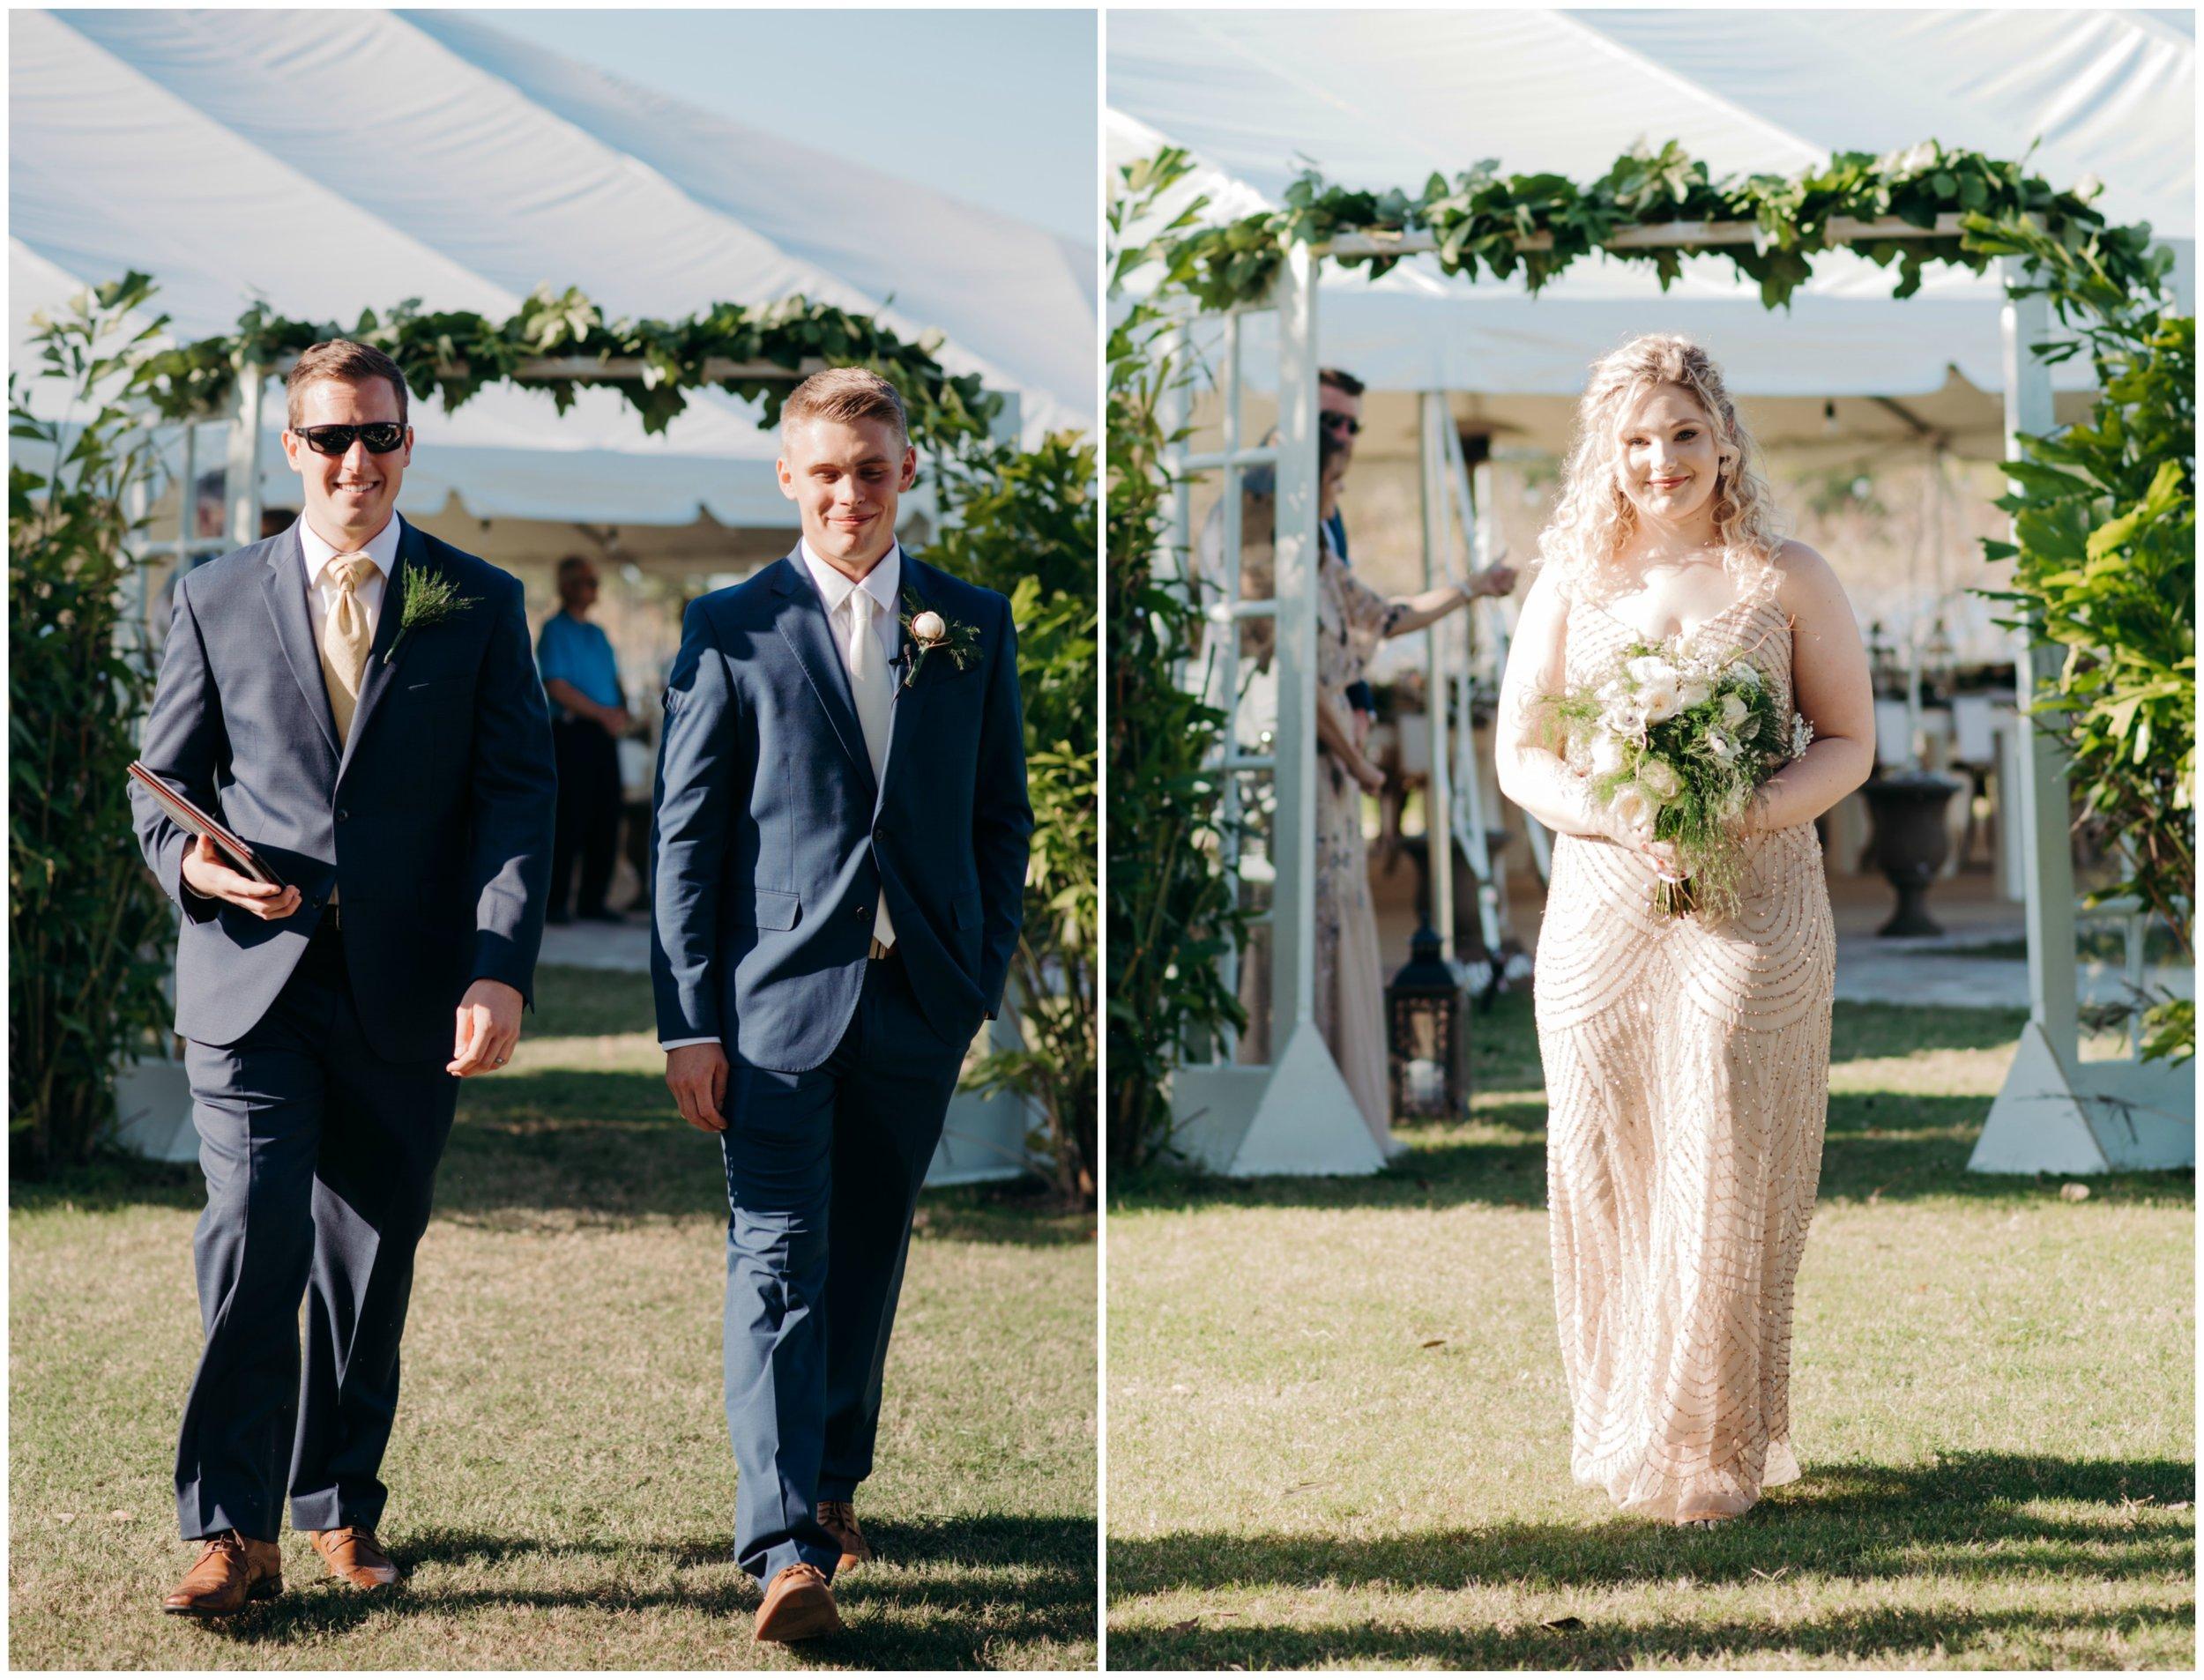 micayla-greyson-wedding-ceremony-intros-1.jpg